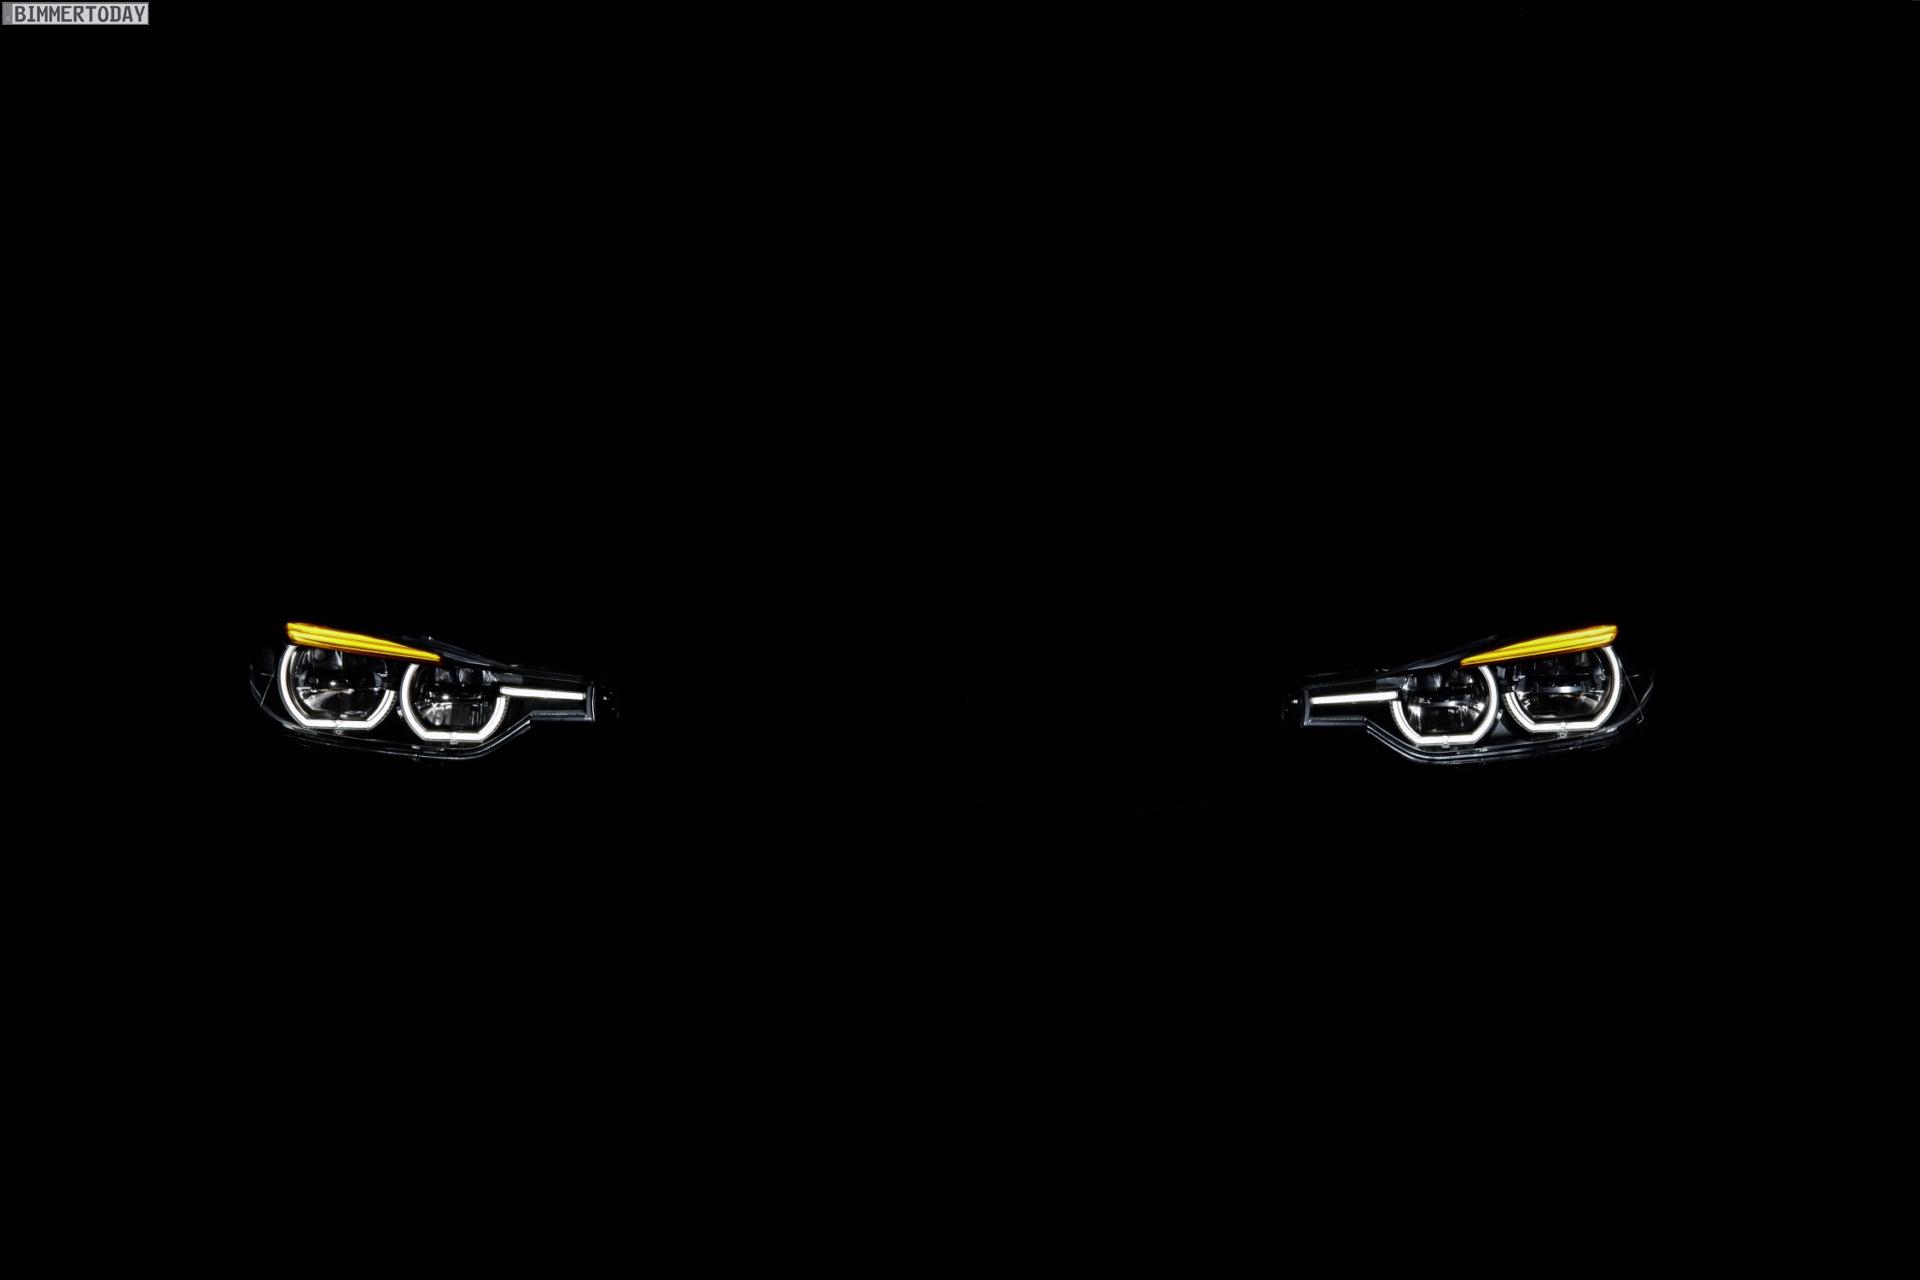 lighting custom shoppmlit bulbs eyes headlamp angel headlight auto lights demon bmw red headlights led rings halo oracle drl parts car series accessories kit